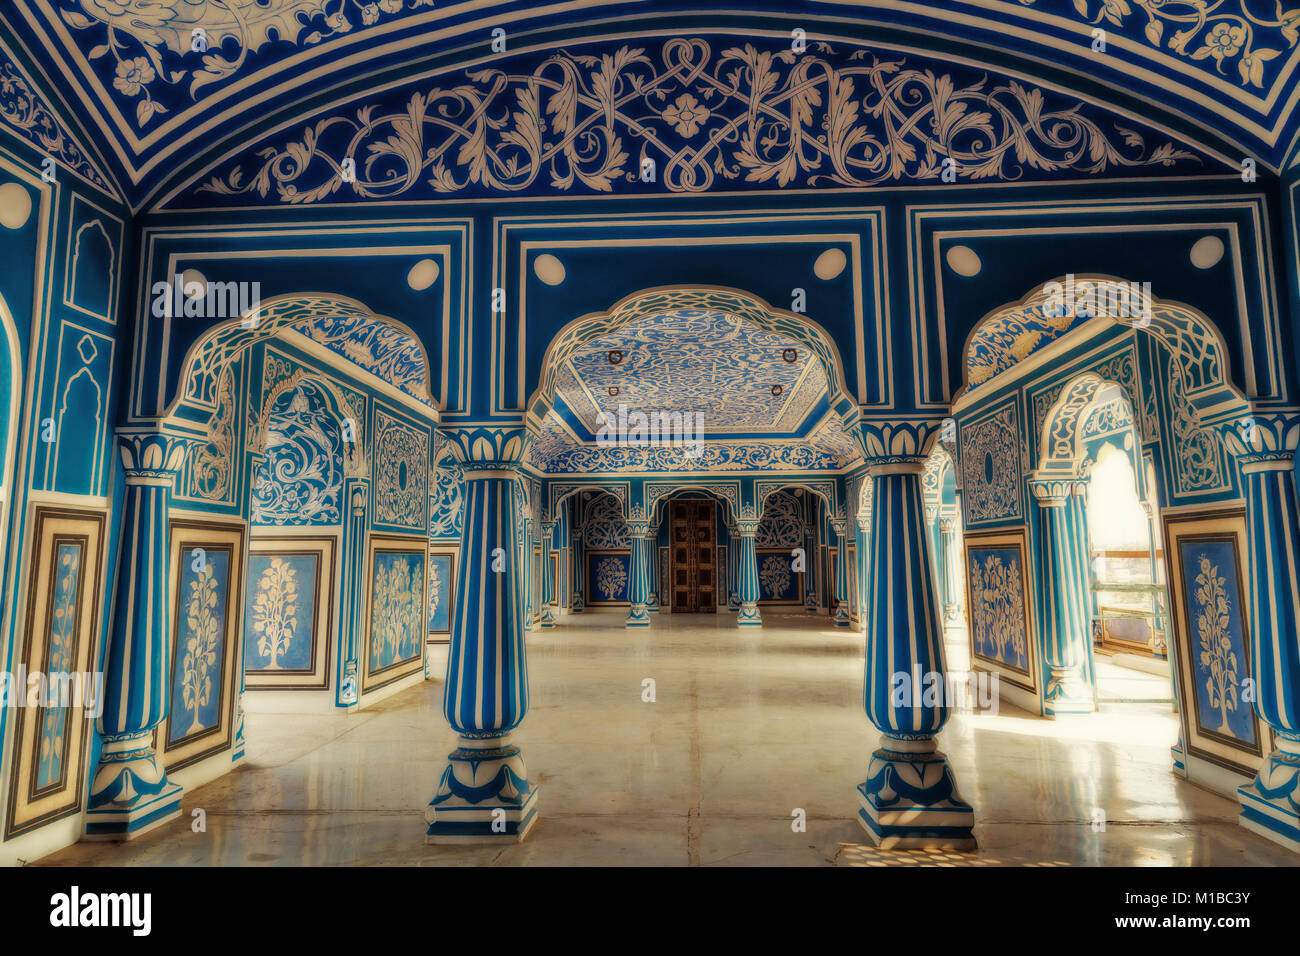 jaipur city palace interior stock photos jaipur city palace interior stock images alamy. Black Bedroom Furniture Sets. Home Design Ideas